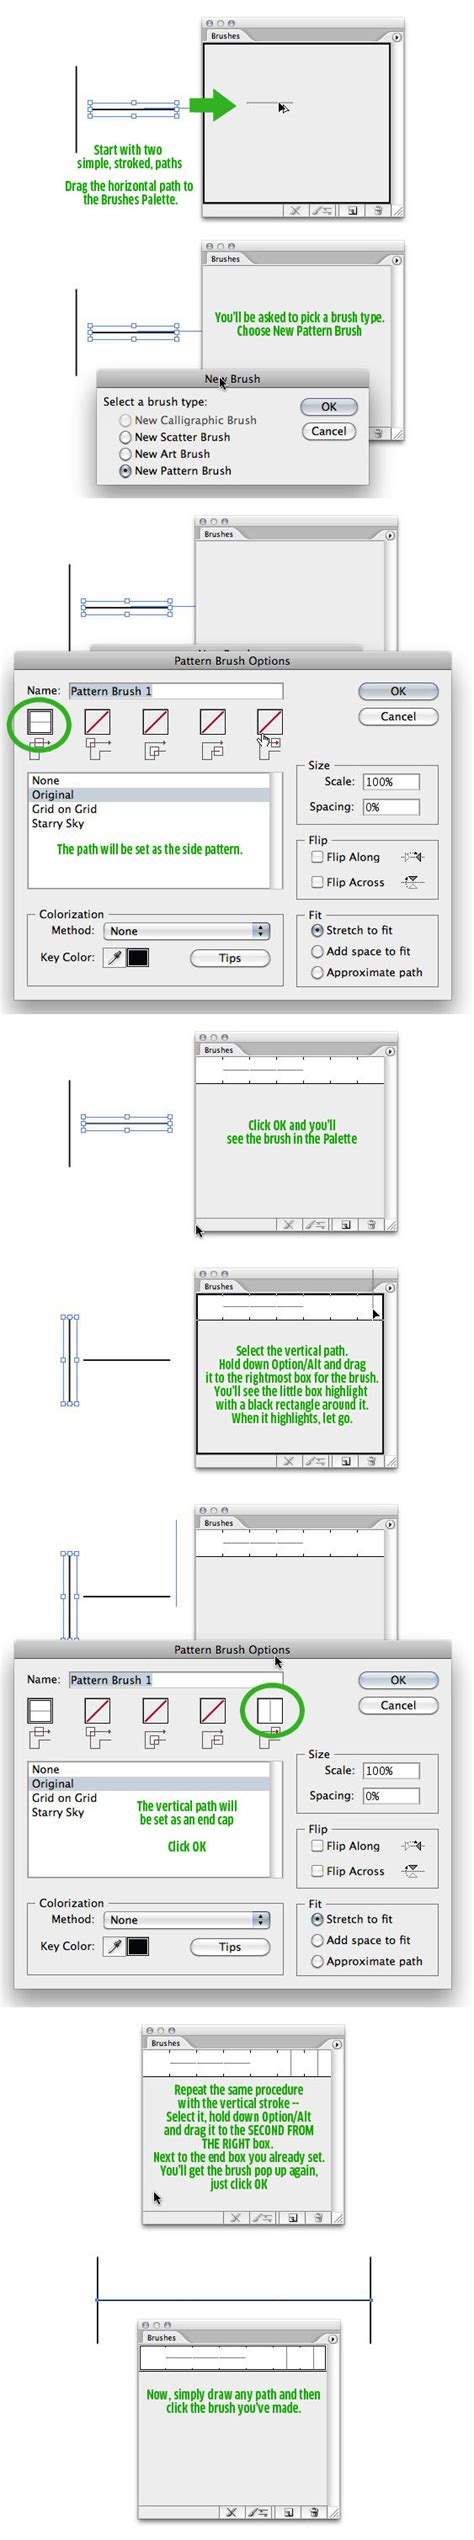 make pattern brush illustrator cs6 how to create my own arrow effects in illustrator cs 2